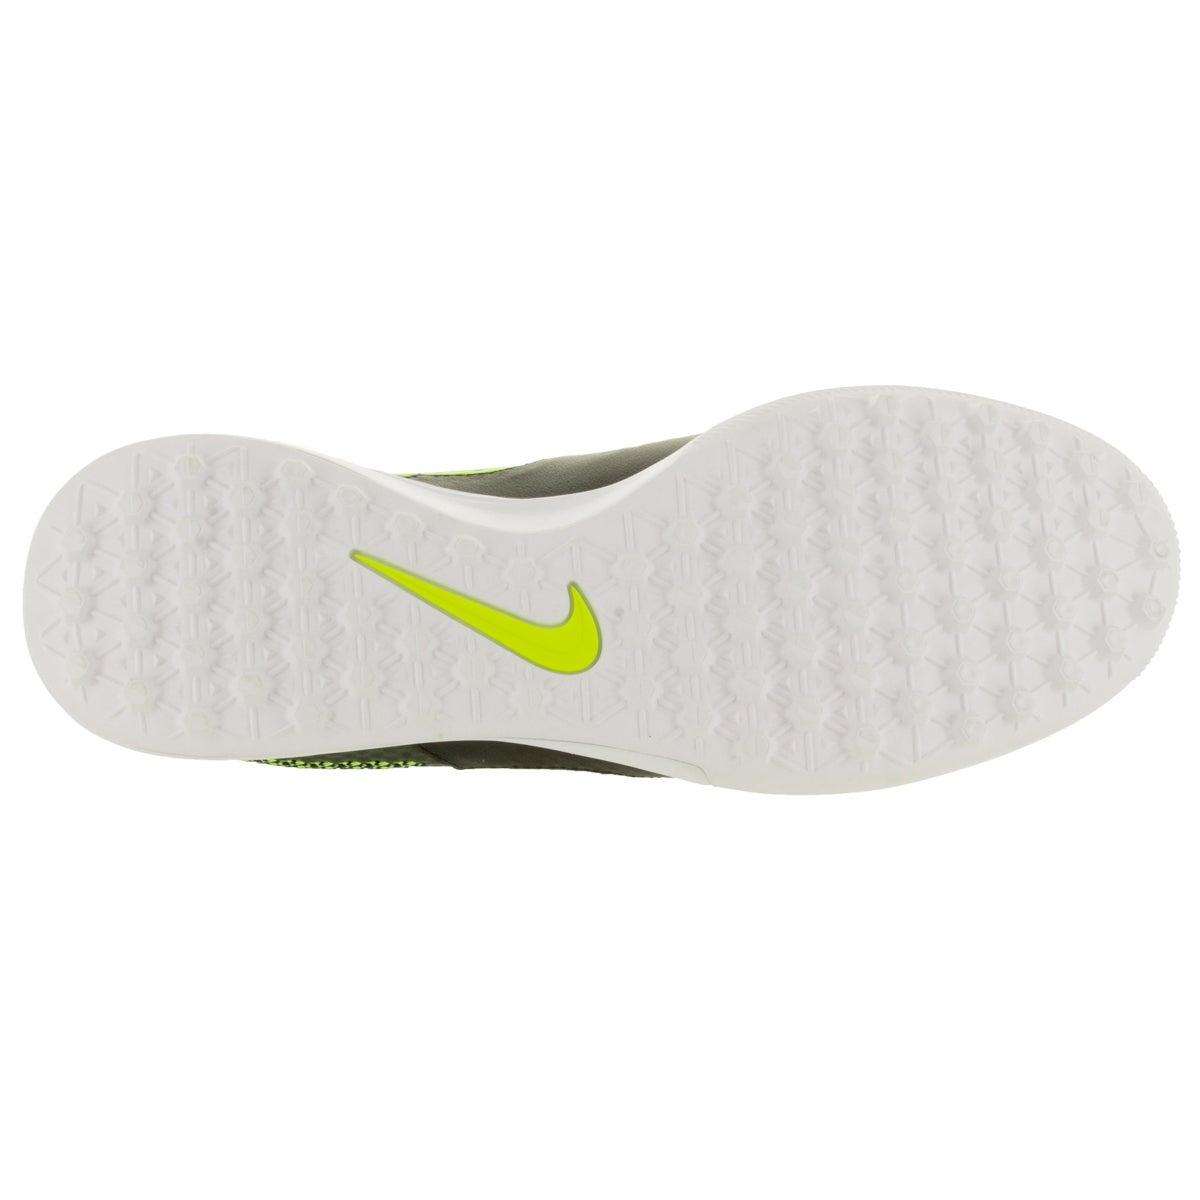 4742a5c40 Shop Nike Men s Magistax Finale Tf Black Black Volt White Turf Soccer Shoe  - Free Shipping Today - - 12329248